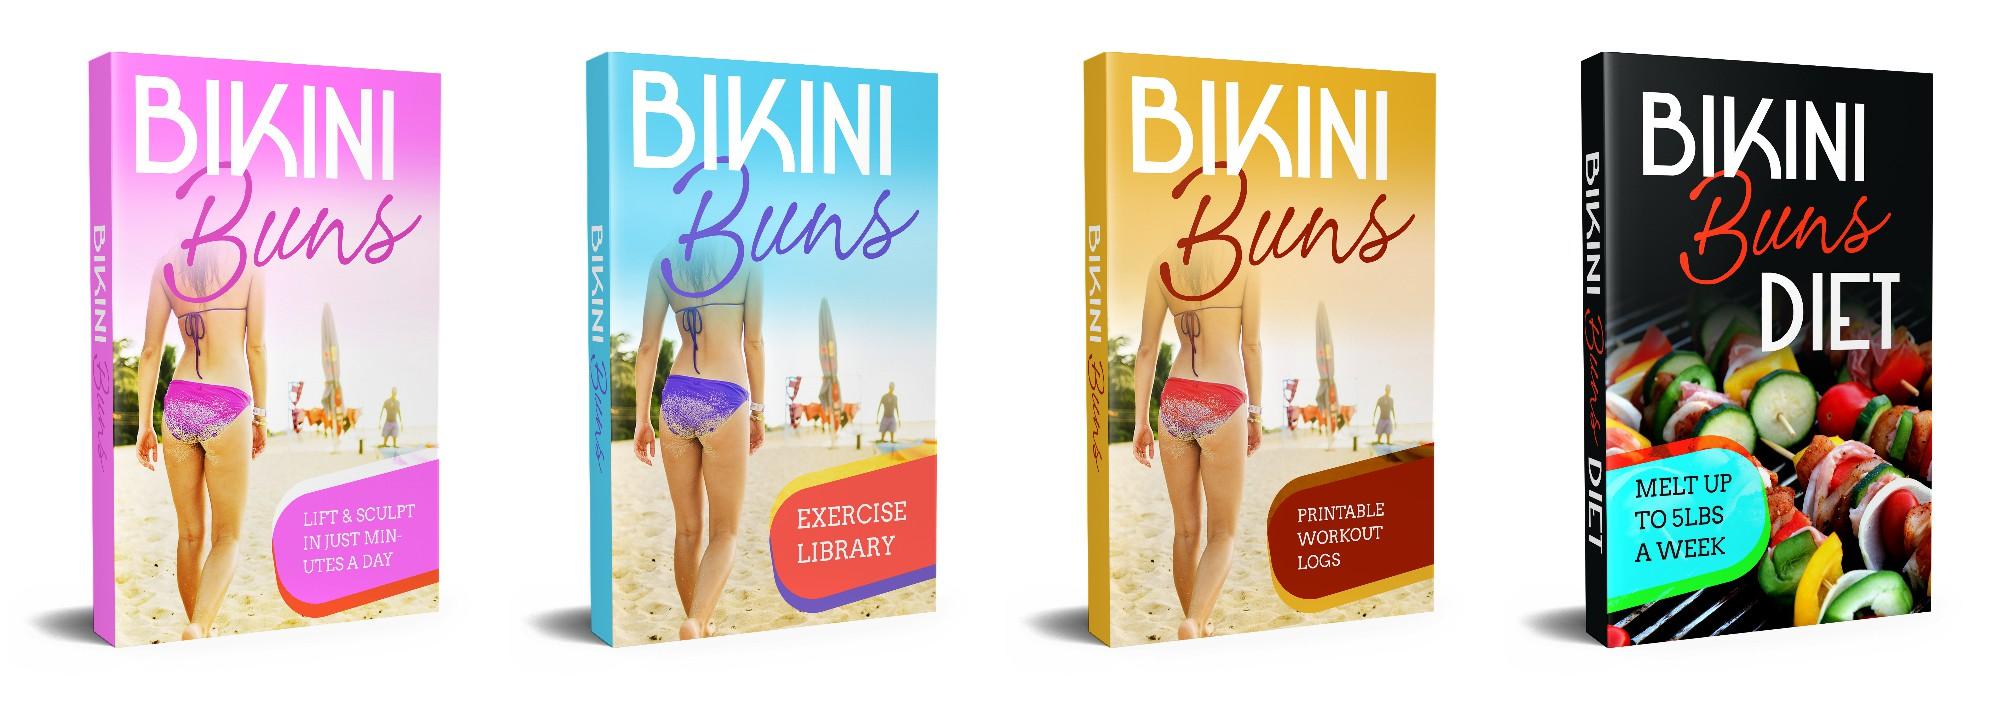 Bikini Buns   New At home Butt Shaping System  Image of bikini buns1